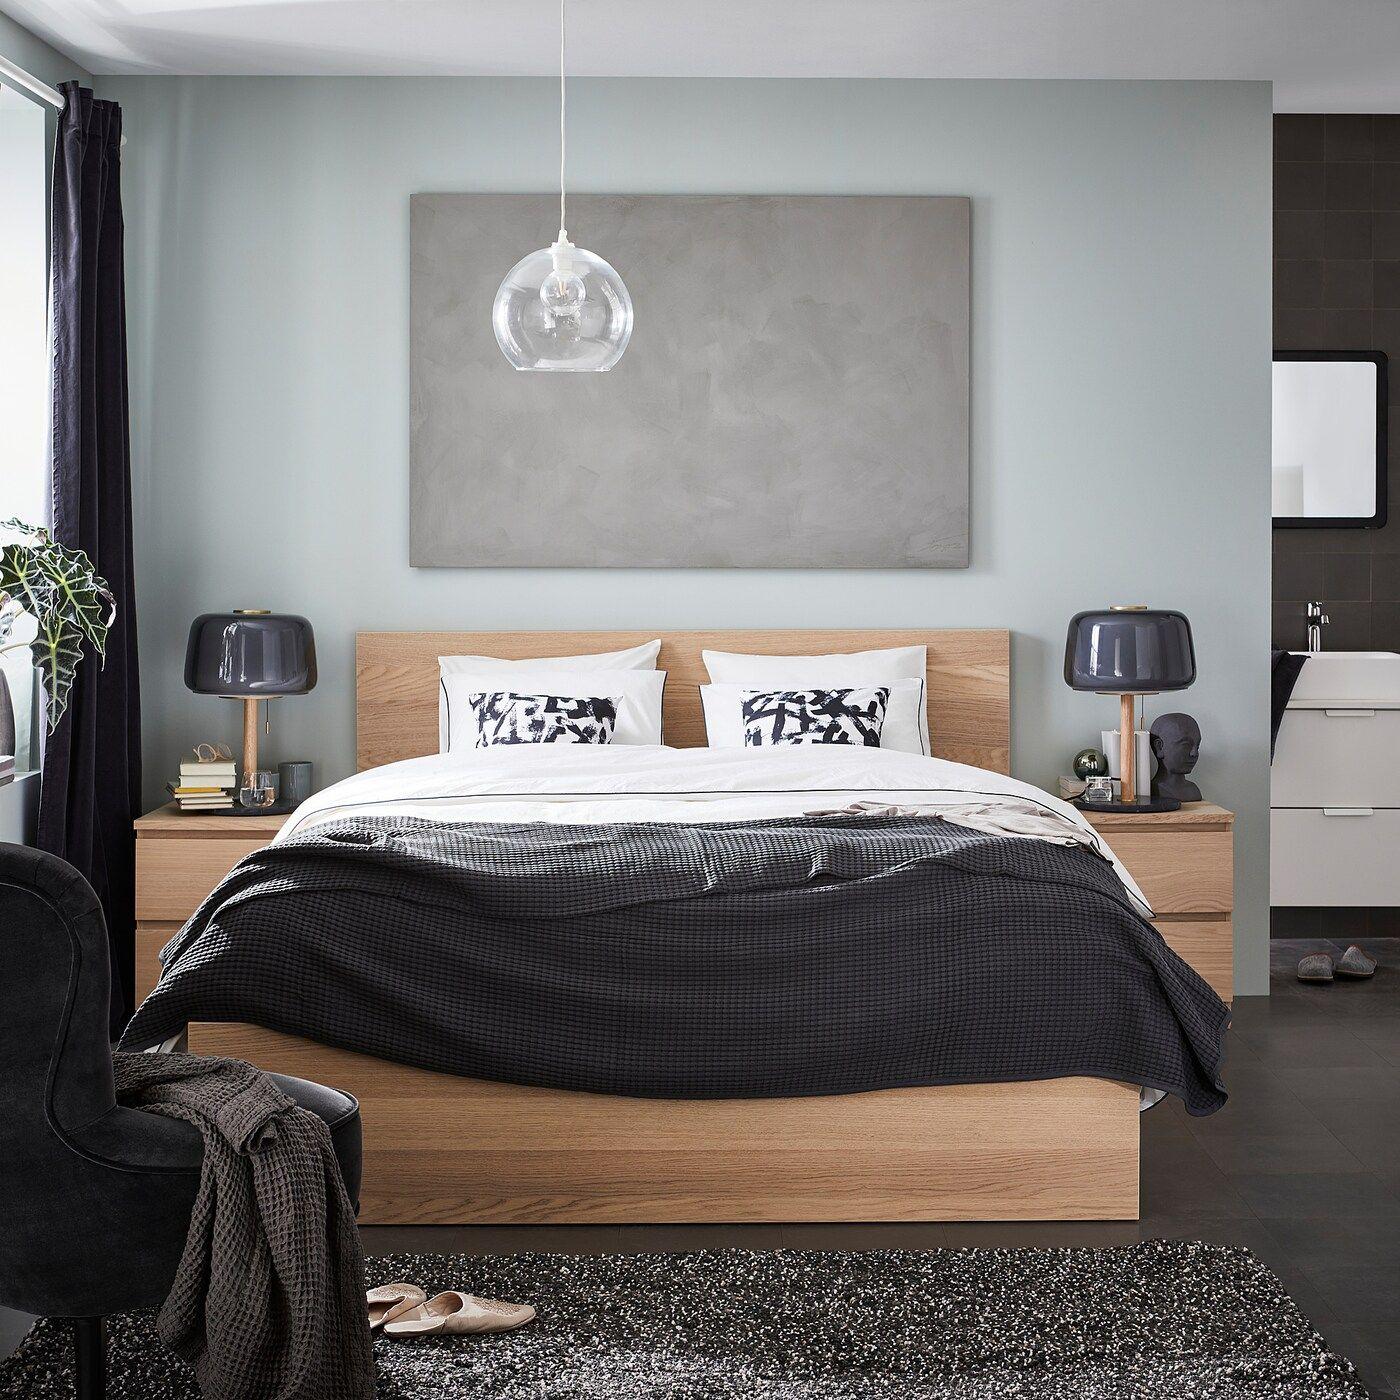 Best Ikea Malm White Stained Oak Veneer Luröy Bed Frame High 400 x 300